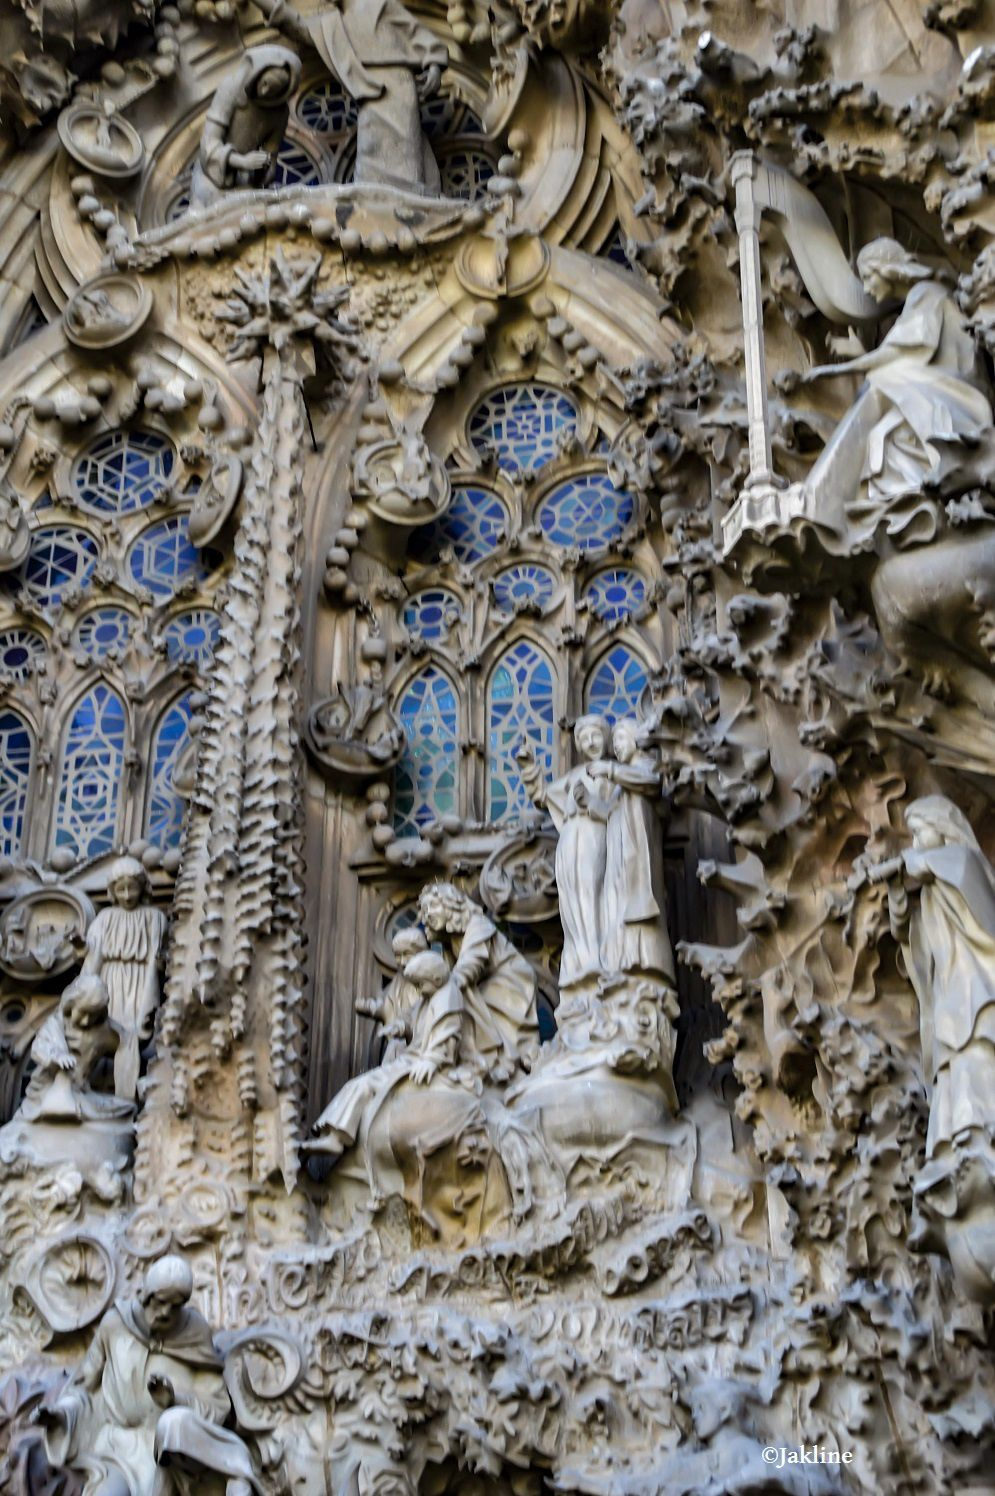 Le chantier de la Sagrada Familia